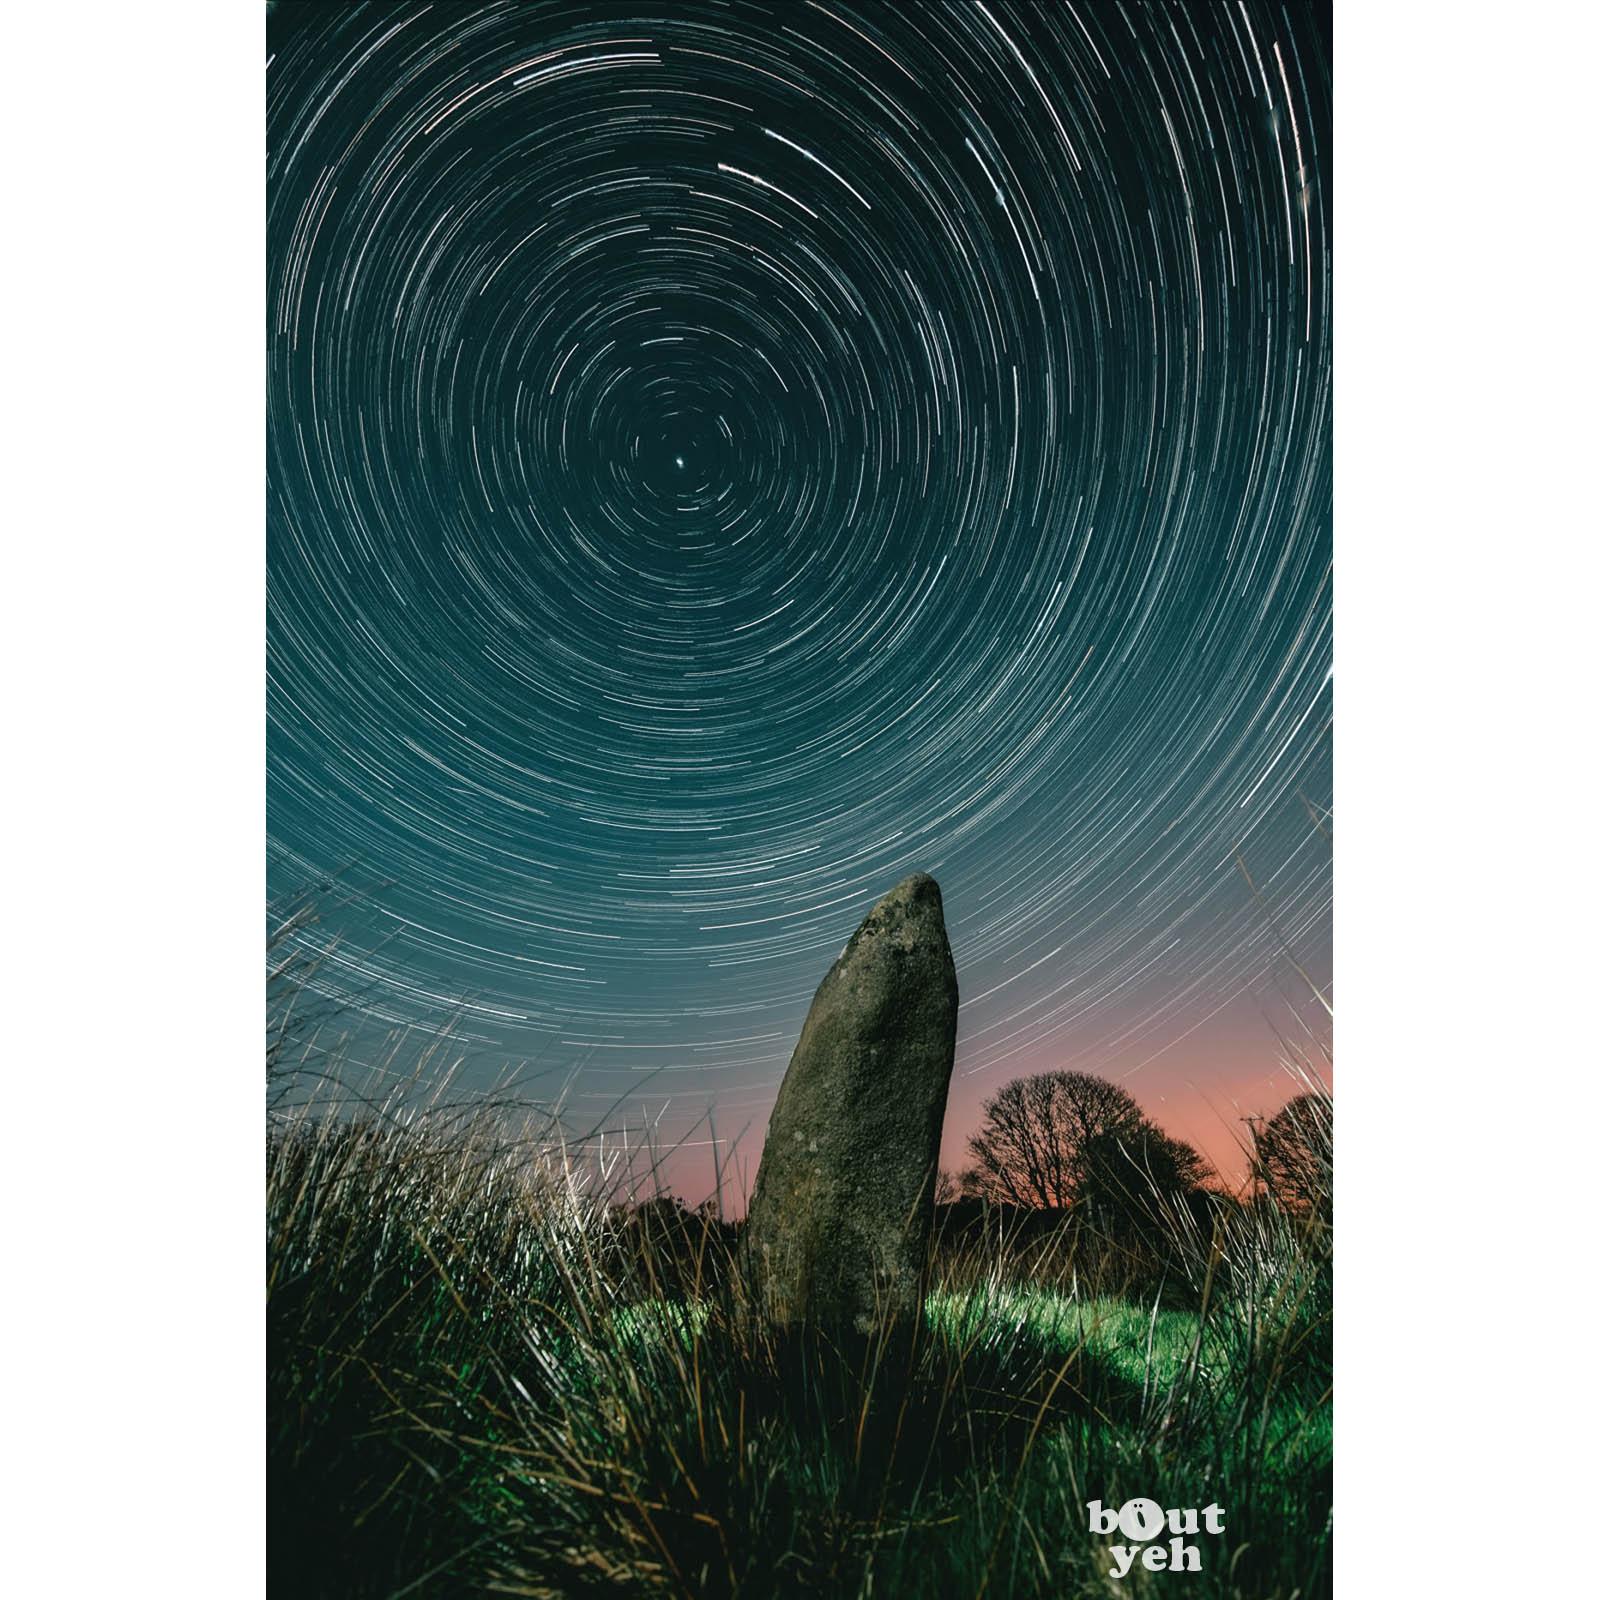 Ballard Stone Northern Ireland by rskb - photographic print for sale.